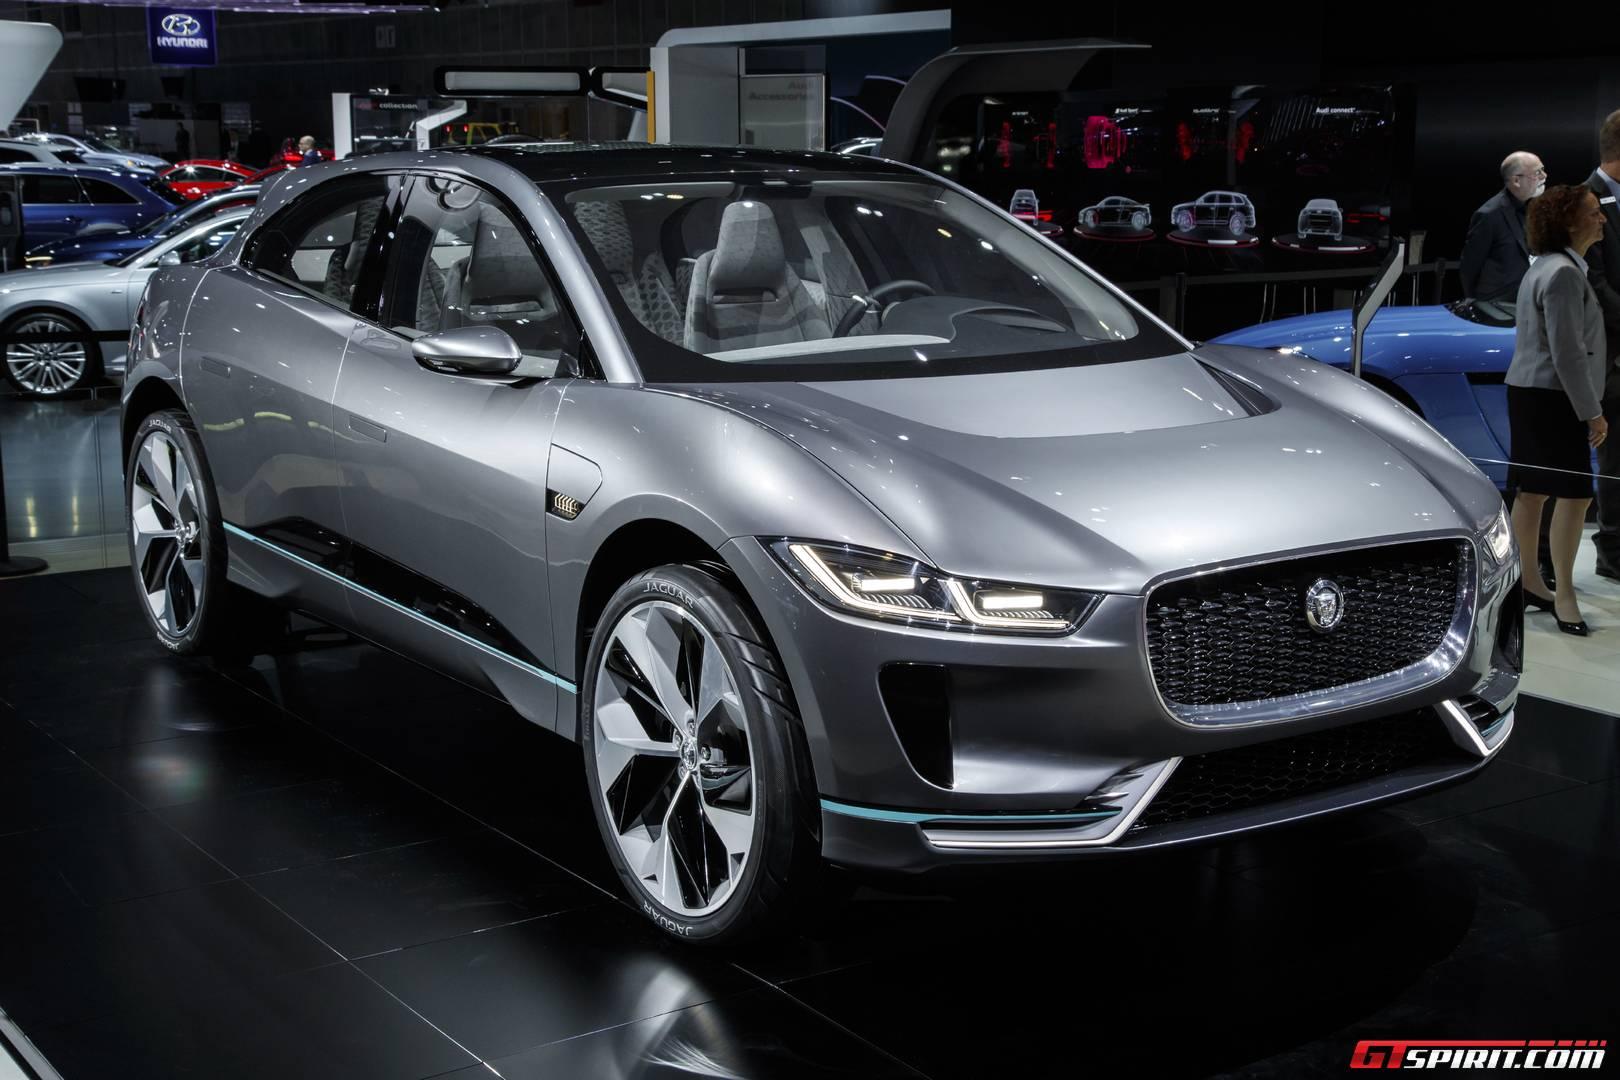 LA Auto Show 2016: Jaguar I-PACE Electric SUV - GTspirit